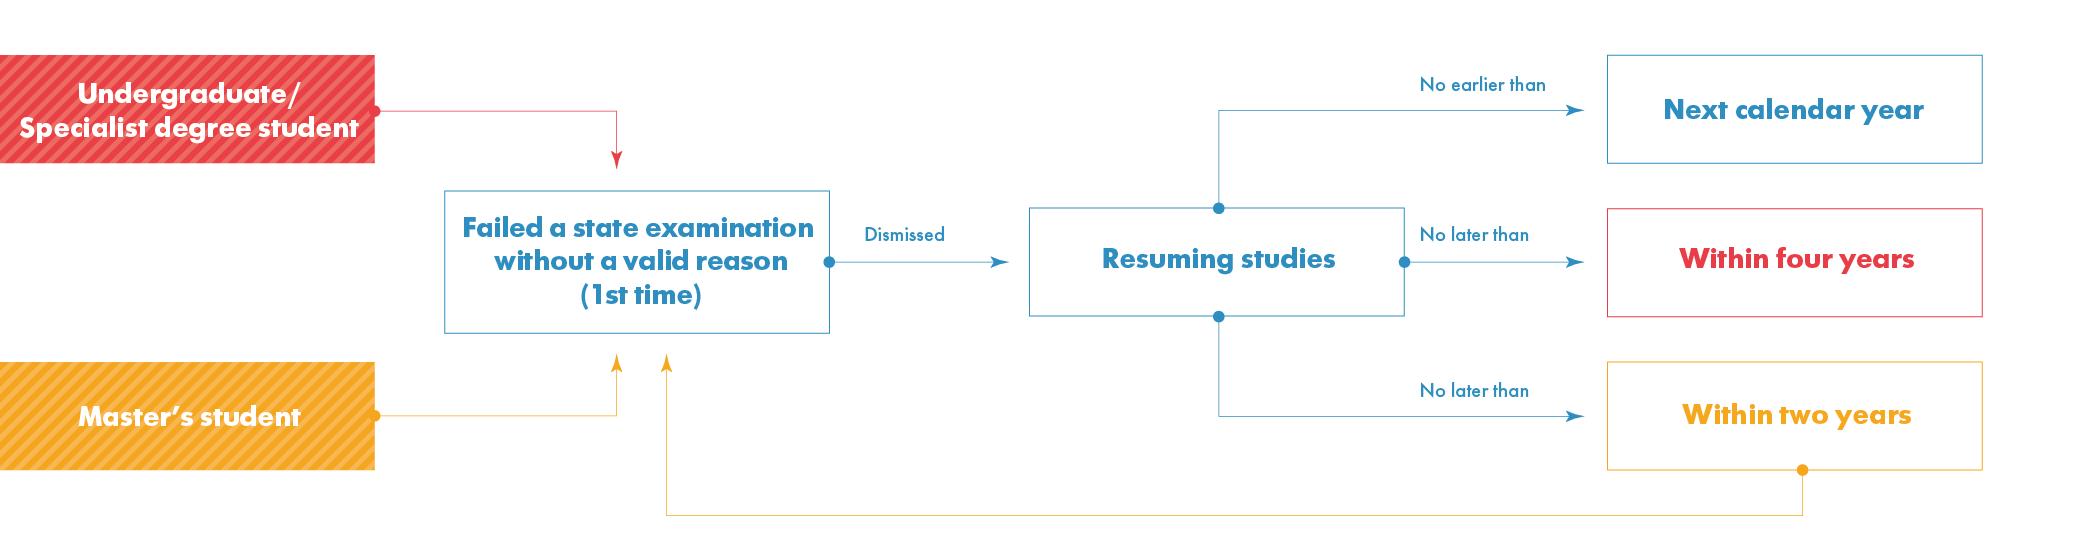 Procedure For Retaking State Examinations Hse Academic Handbook